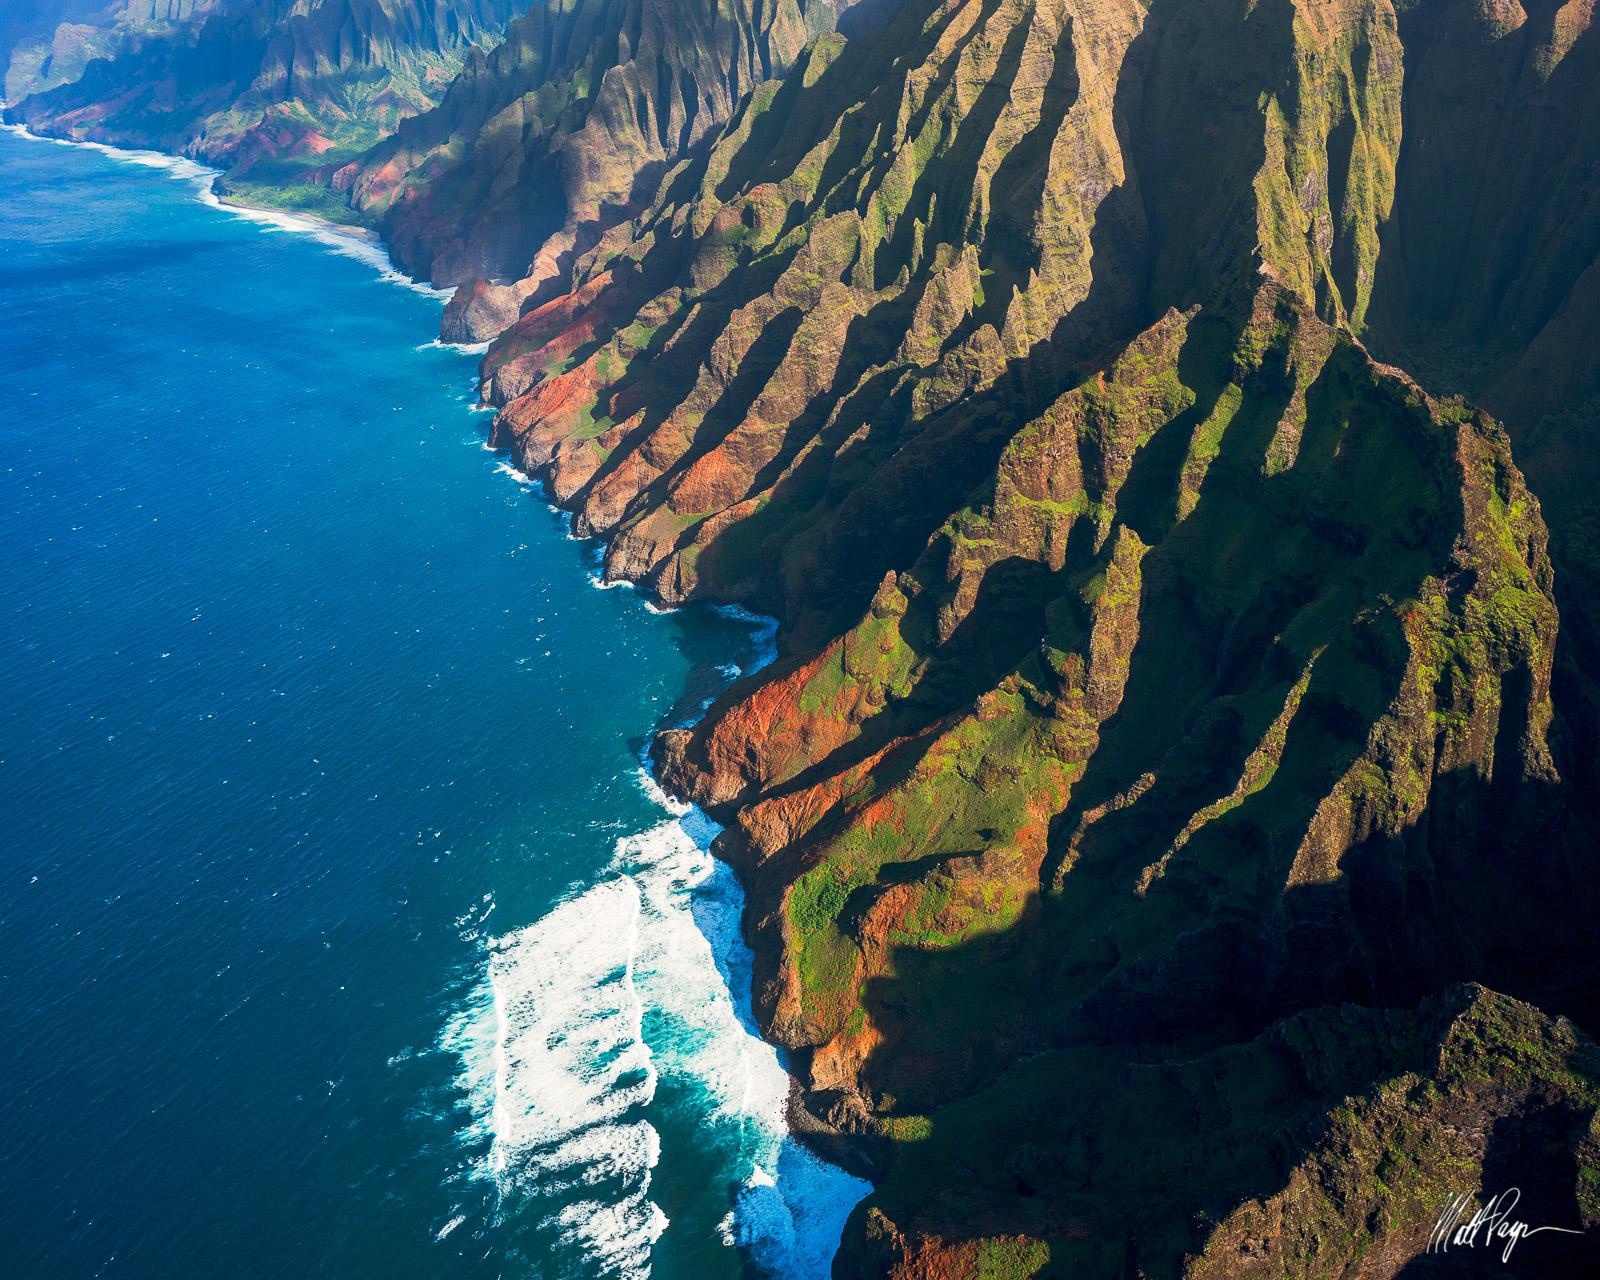 Helicopter, Kauai, Na Pali Coast, Ocean, Rugged, photo